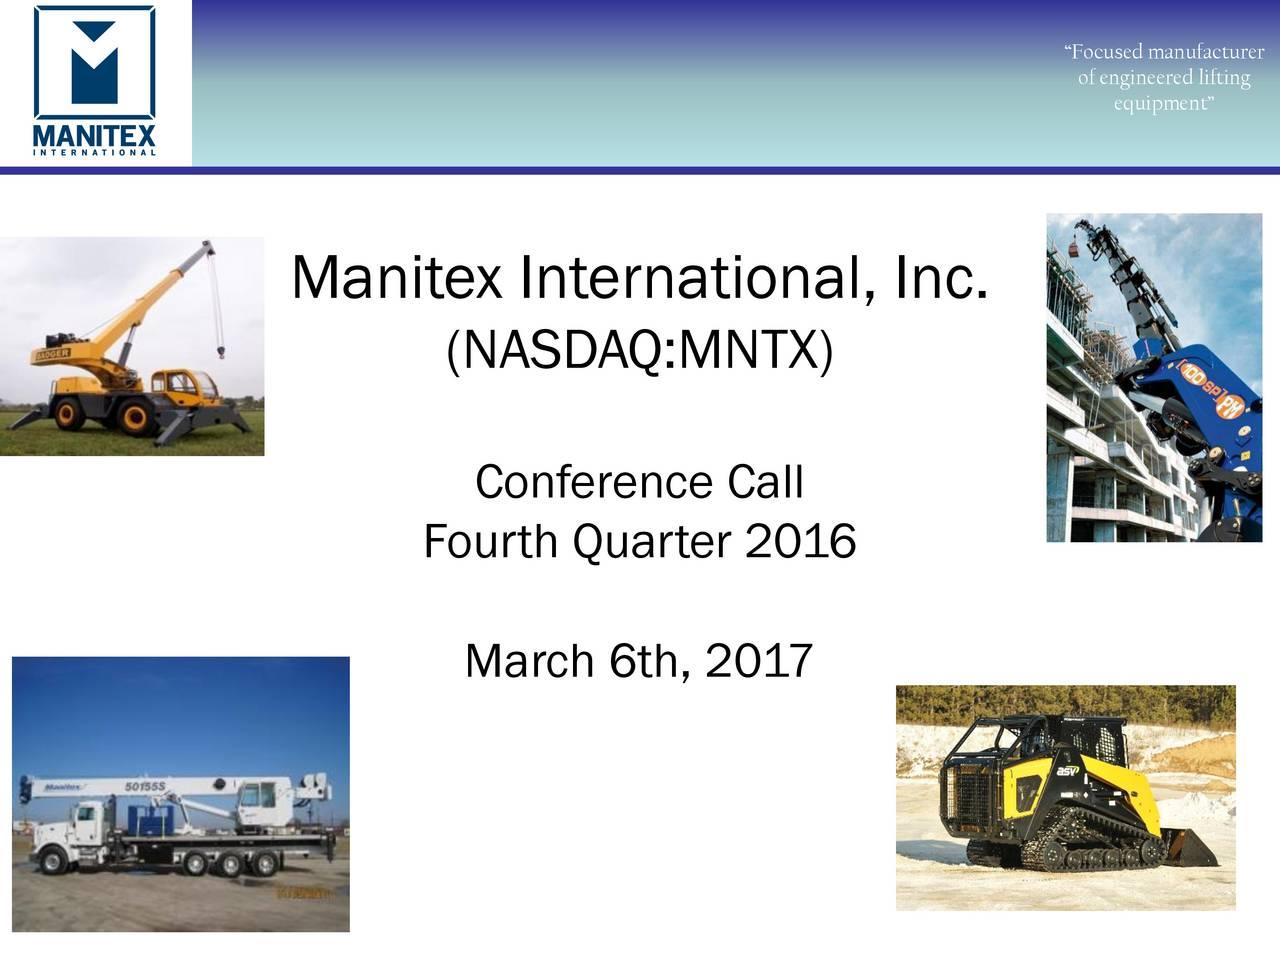 of engineered lifting equipment Manitex International, Inc. (NASDAQ:MNTX) Conference Call Fourth Quarter 2016 March 6th, 2017